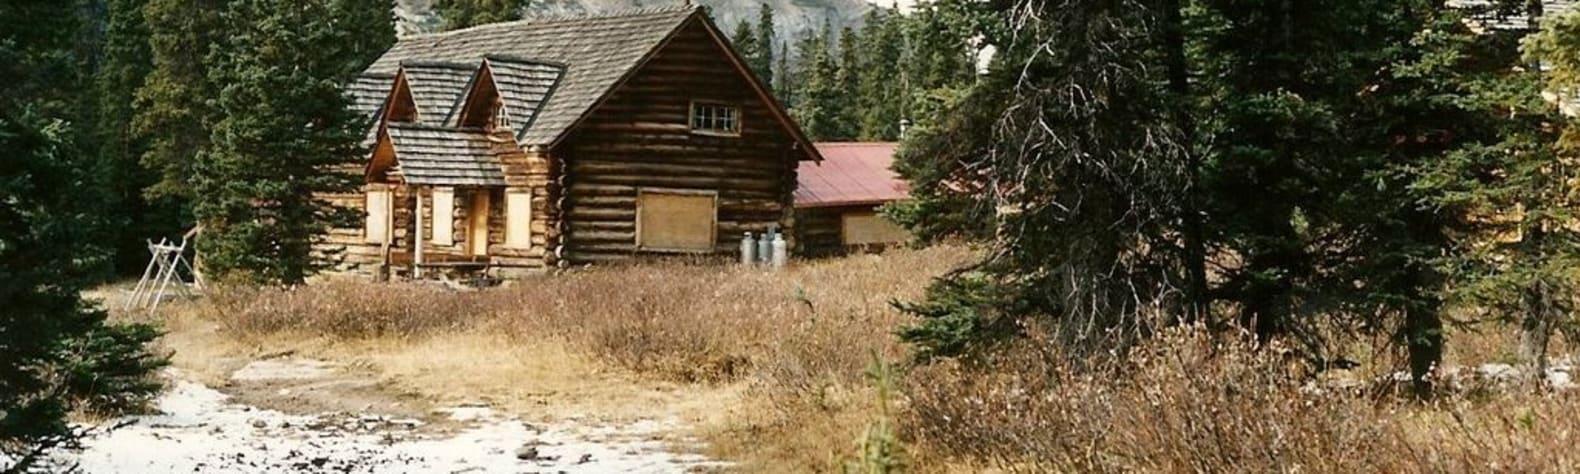 Skoki Ski Lodge National Historic Site